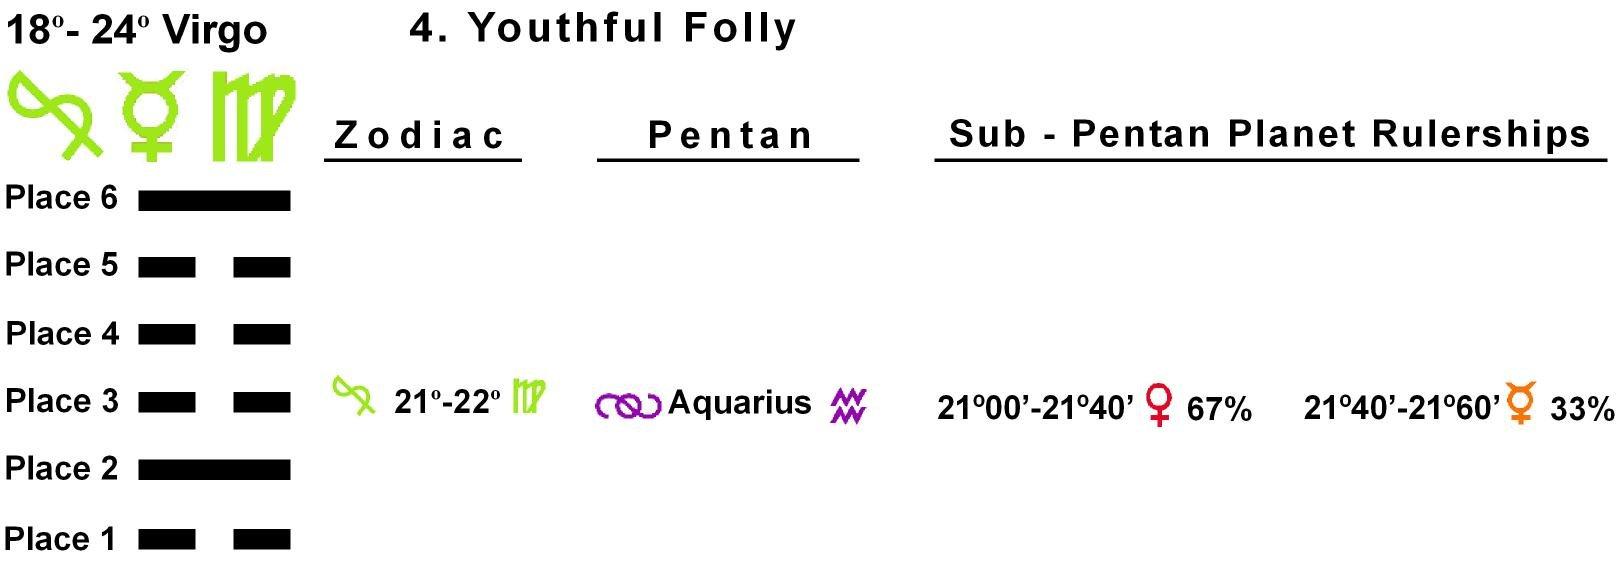 Pent-lines-06VI 21-22 Hx-04 Youthful Folly